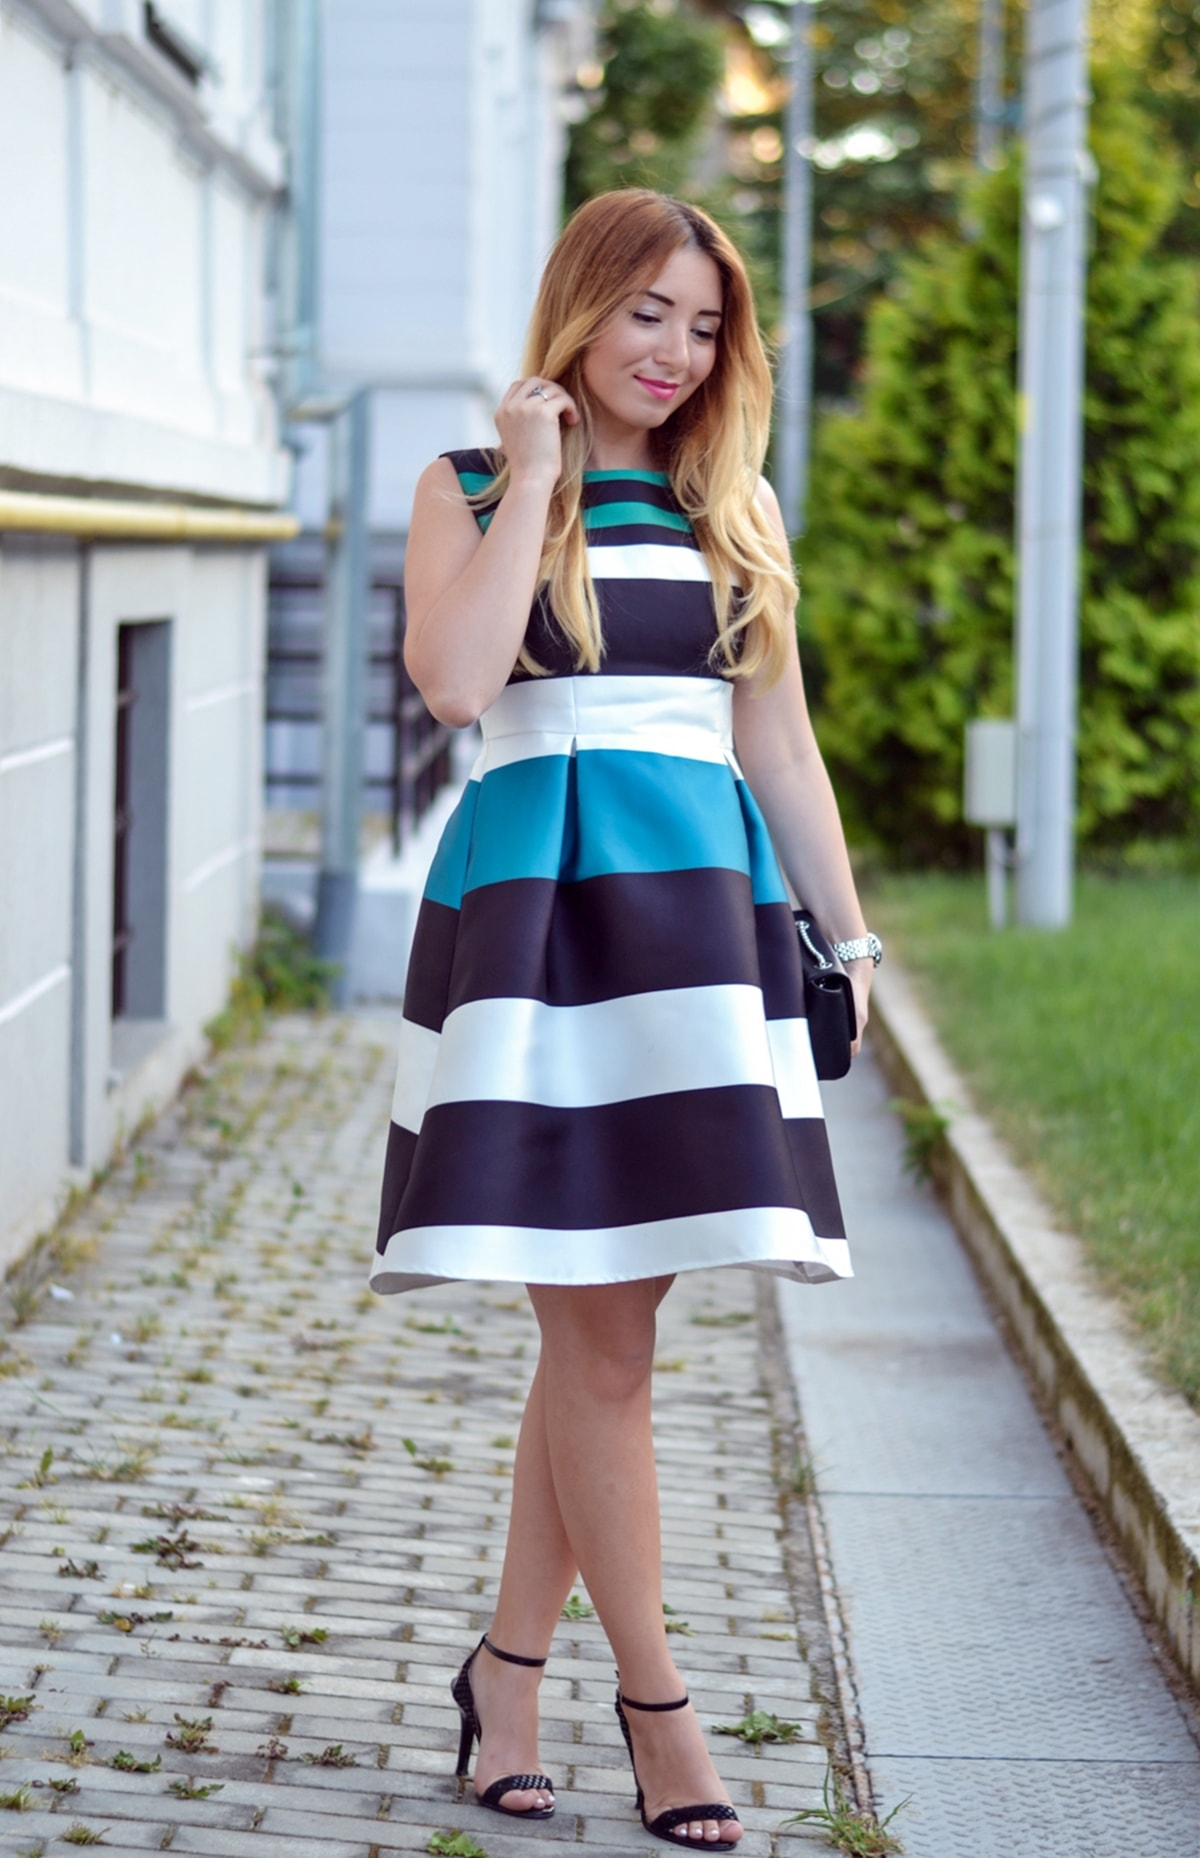 Tinuta eleganta de vara: rochie tafta, dungi colorate